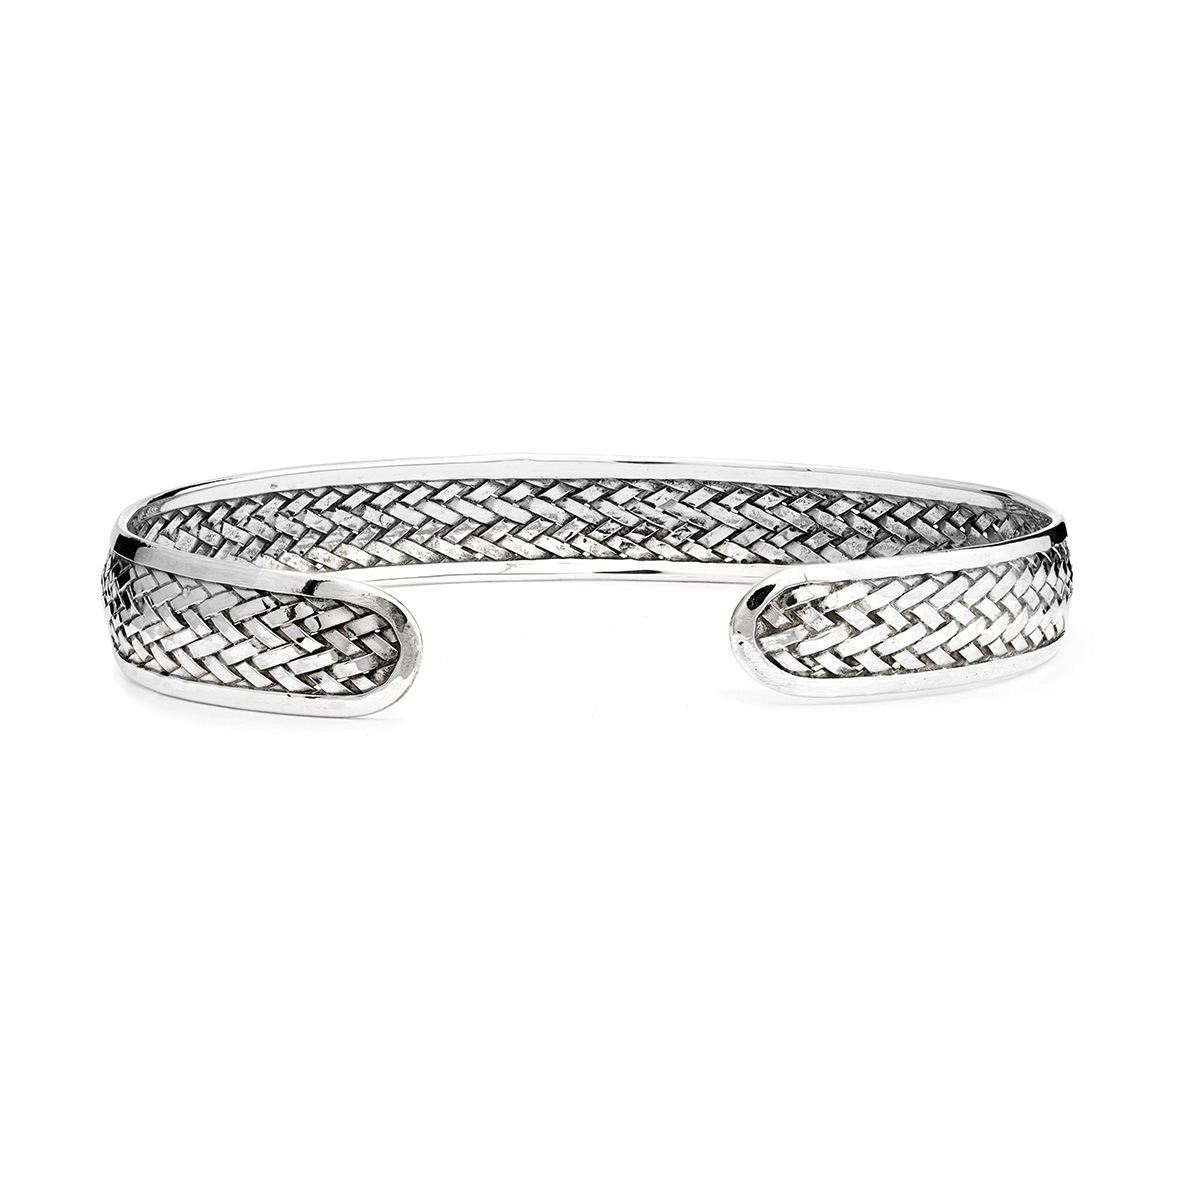 Atuh Silver Bracelet